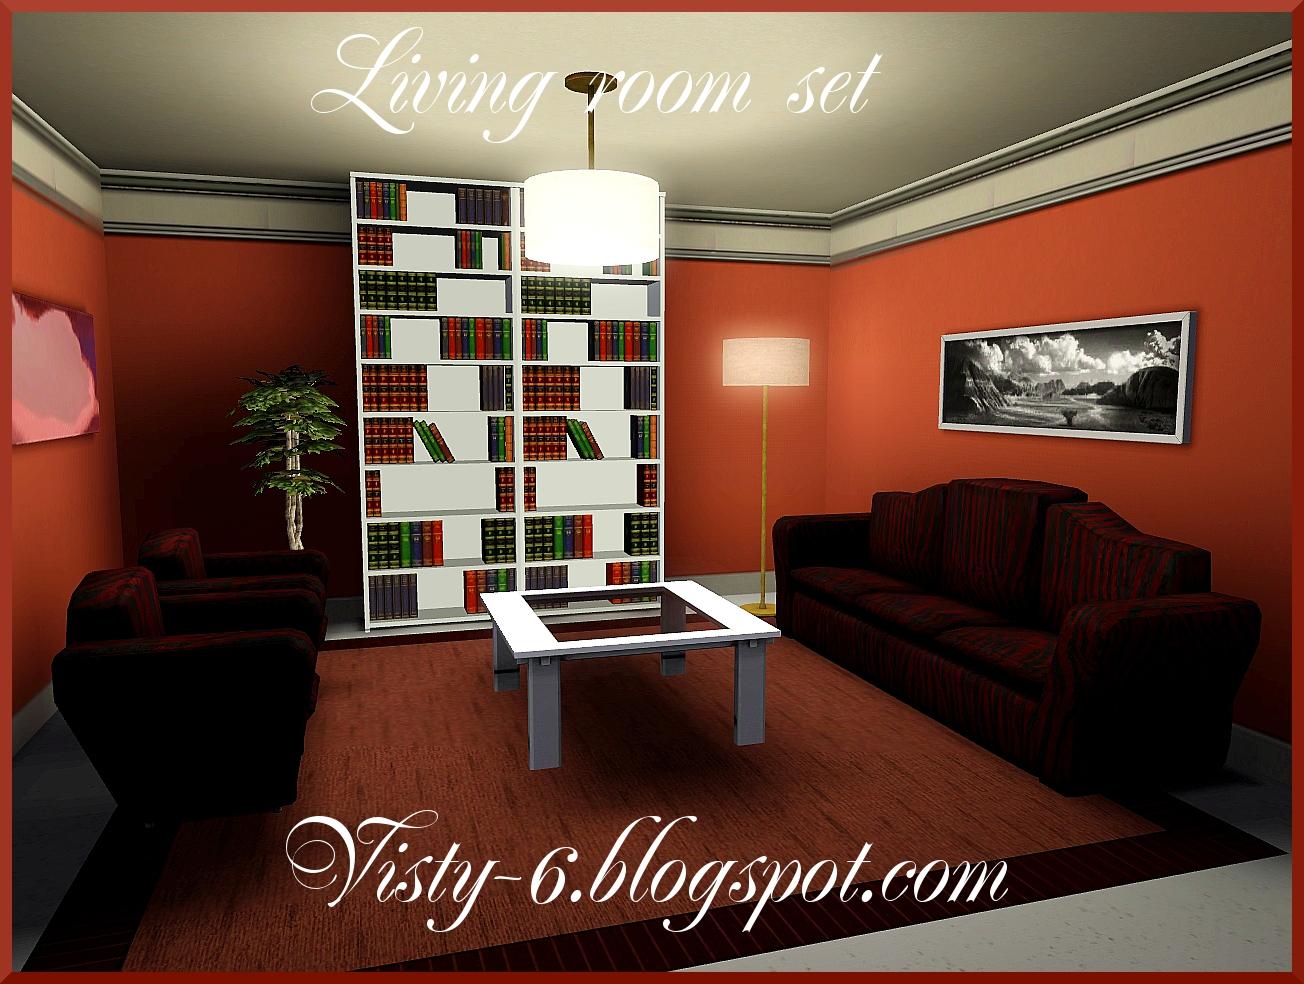 Visty6 Comfortable Living Room Set